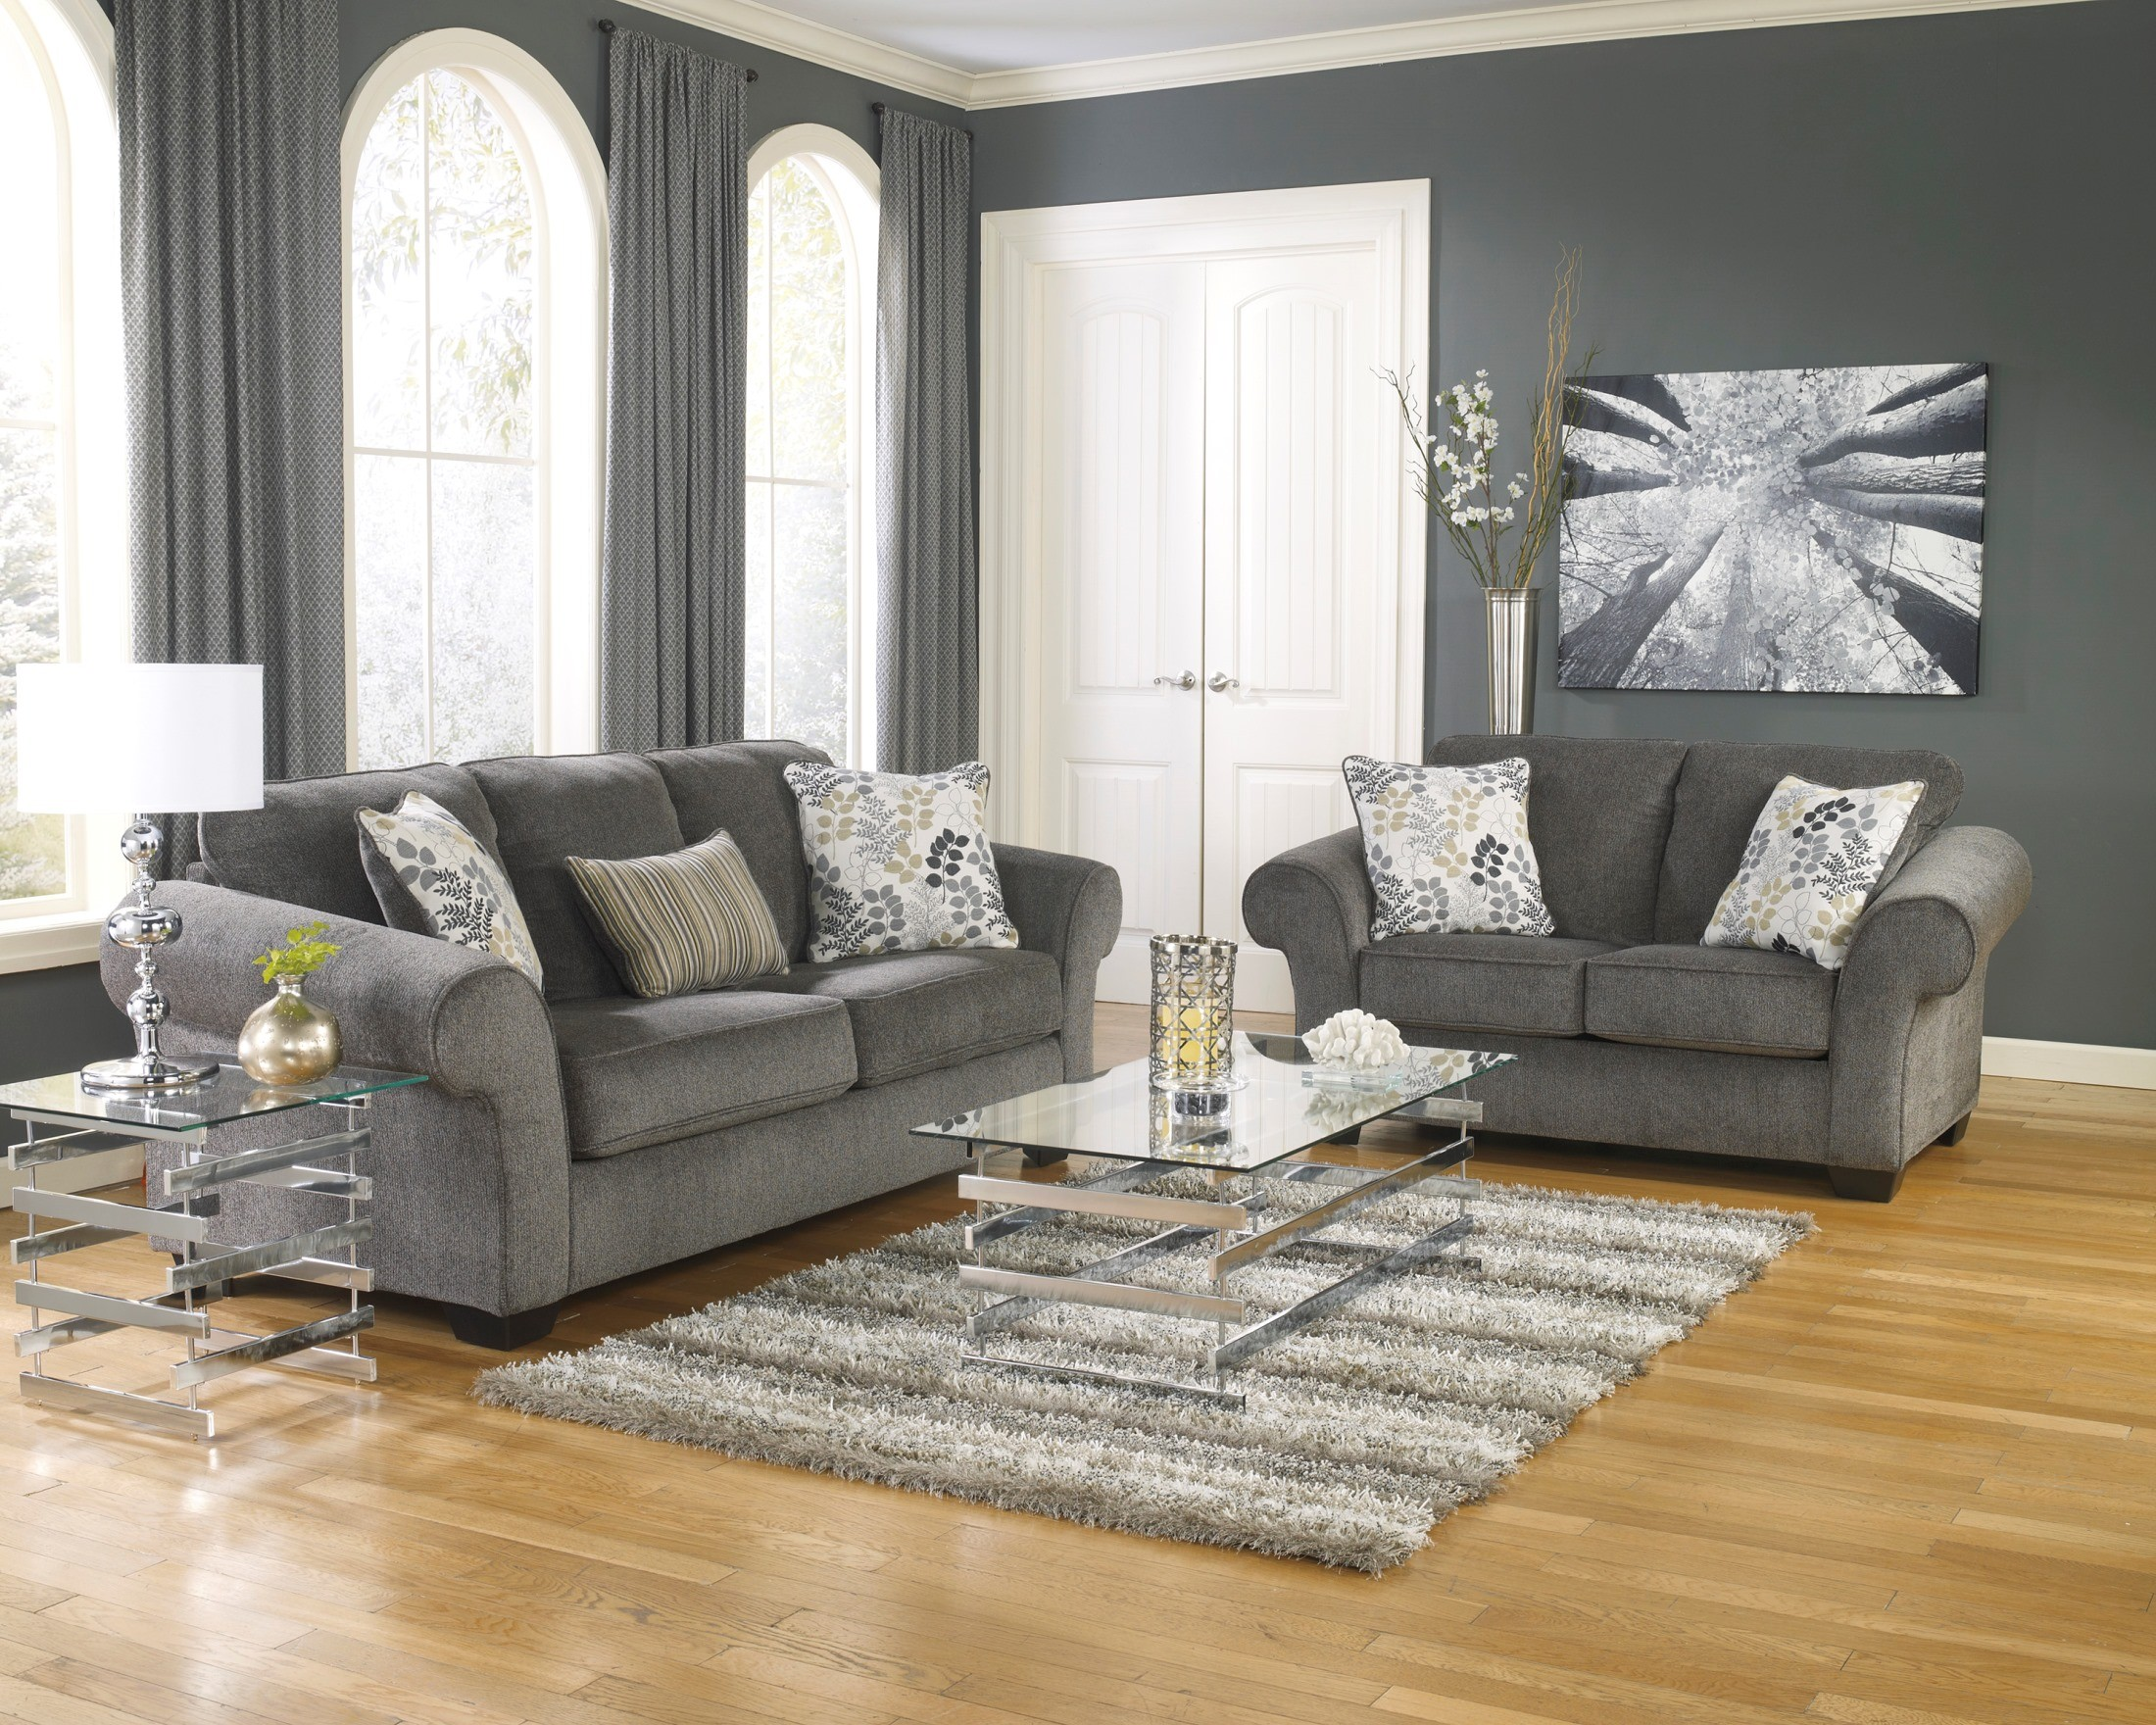 Makonnen Charcoal Queen Sofa Sleeper From Ashley 7800039